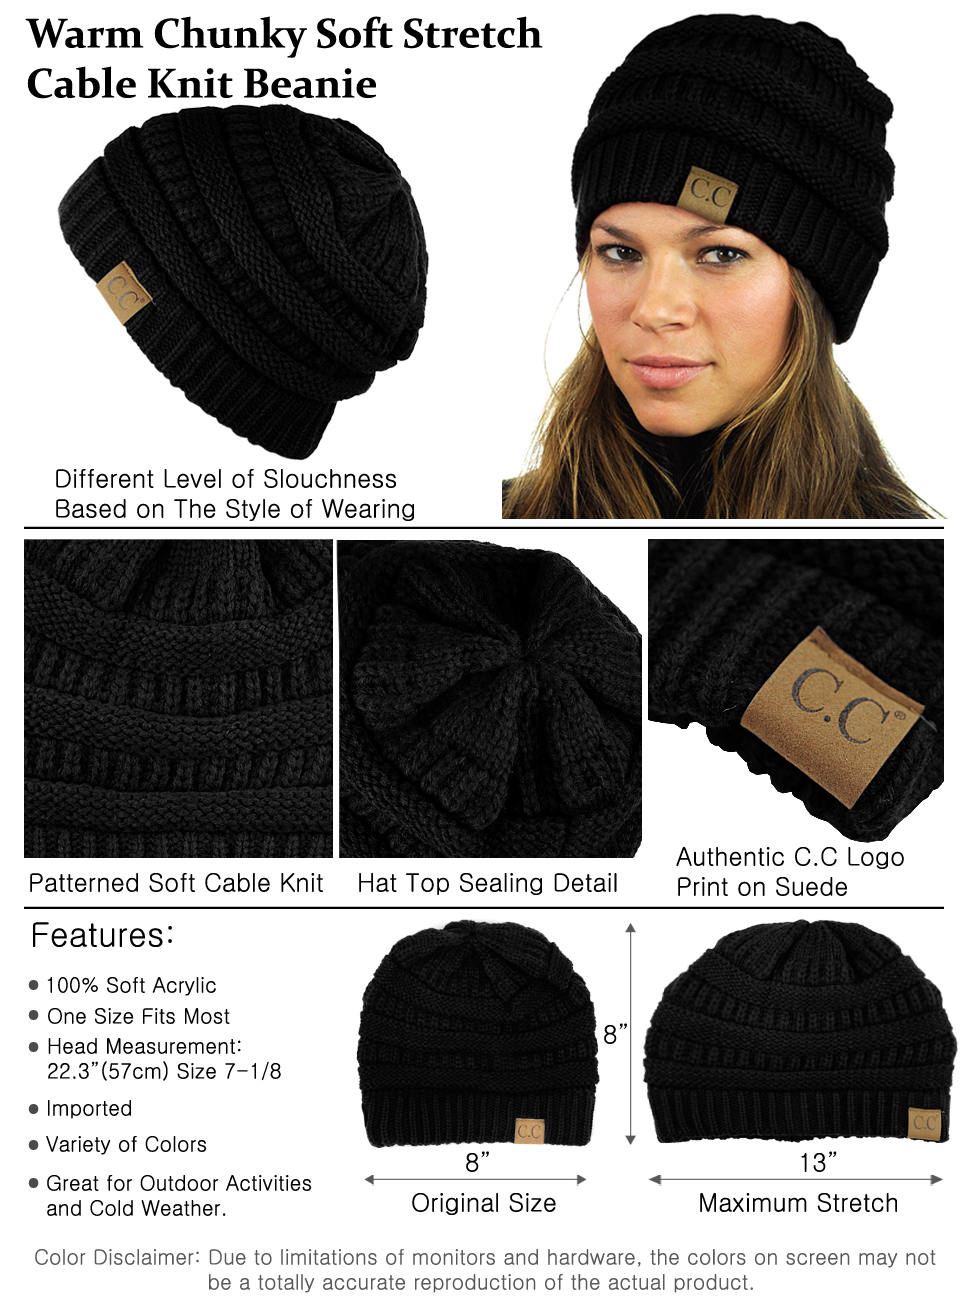 4f4ff769e7c C.C Trendy Warm Chunky Soft Stretch Cable Knit Beanie Skully (2 Tone ...